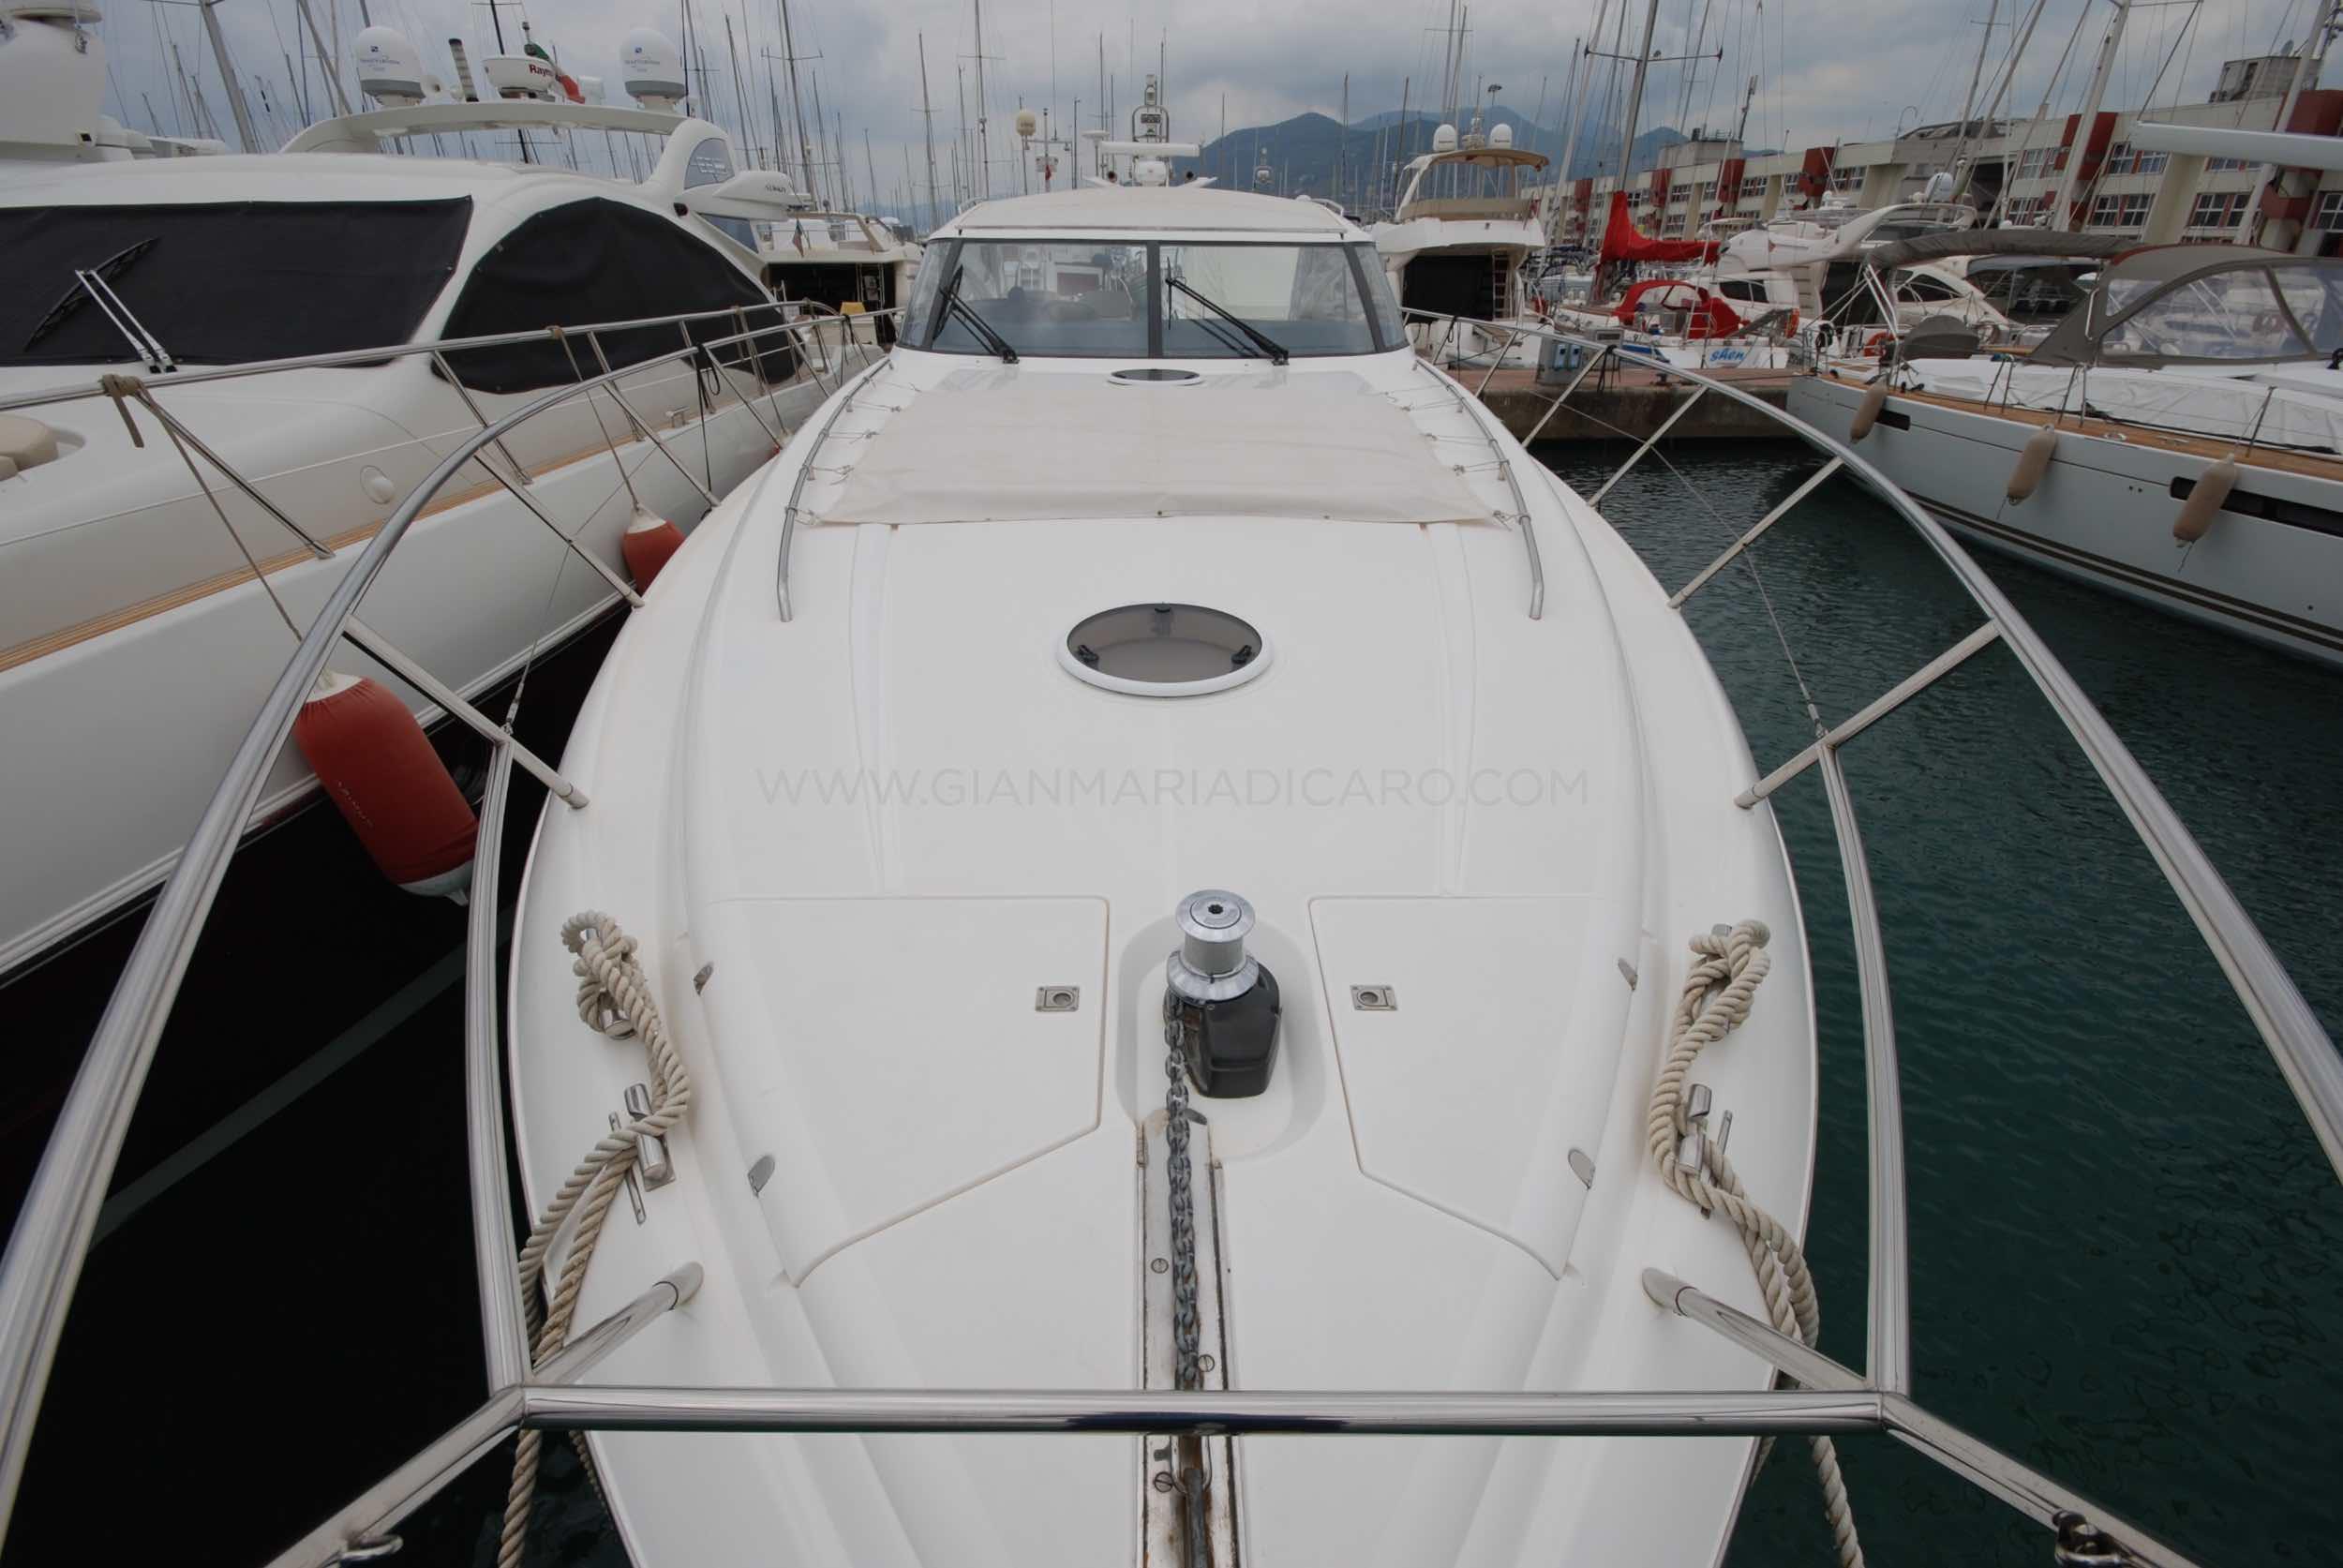 princess-yachts-v58-maestro-di-vita-for-sale-4.jpg